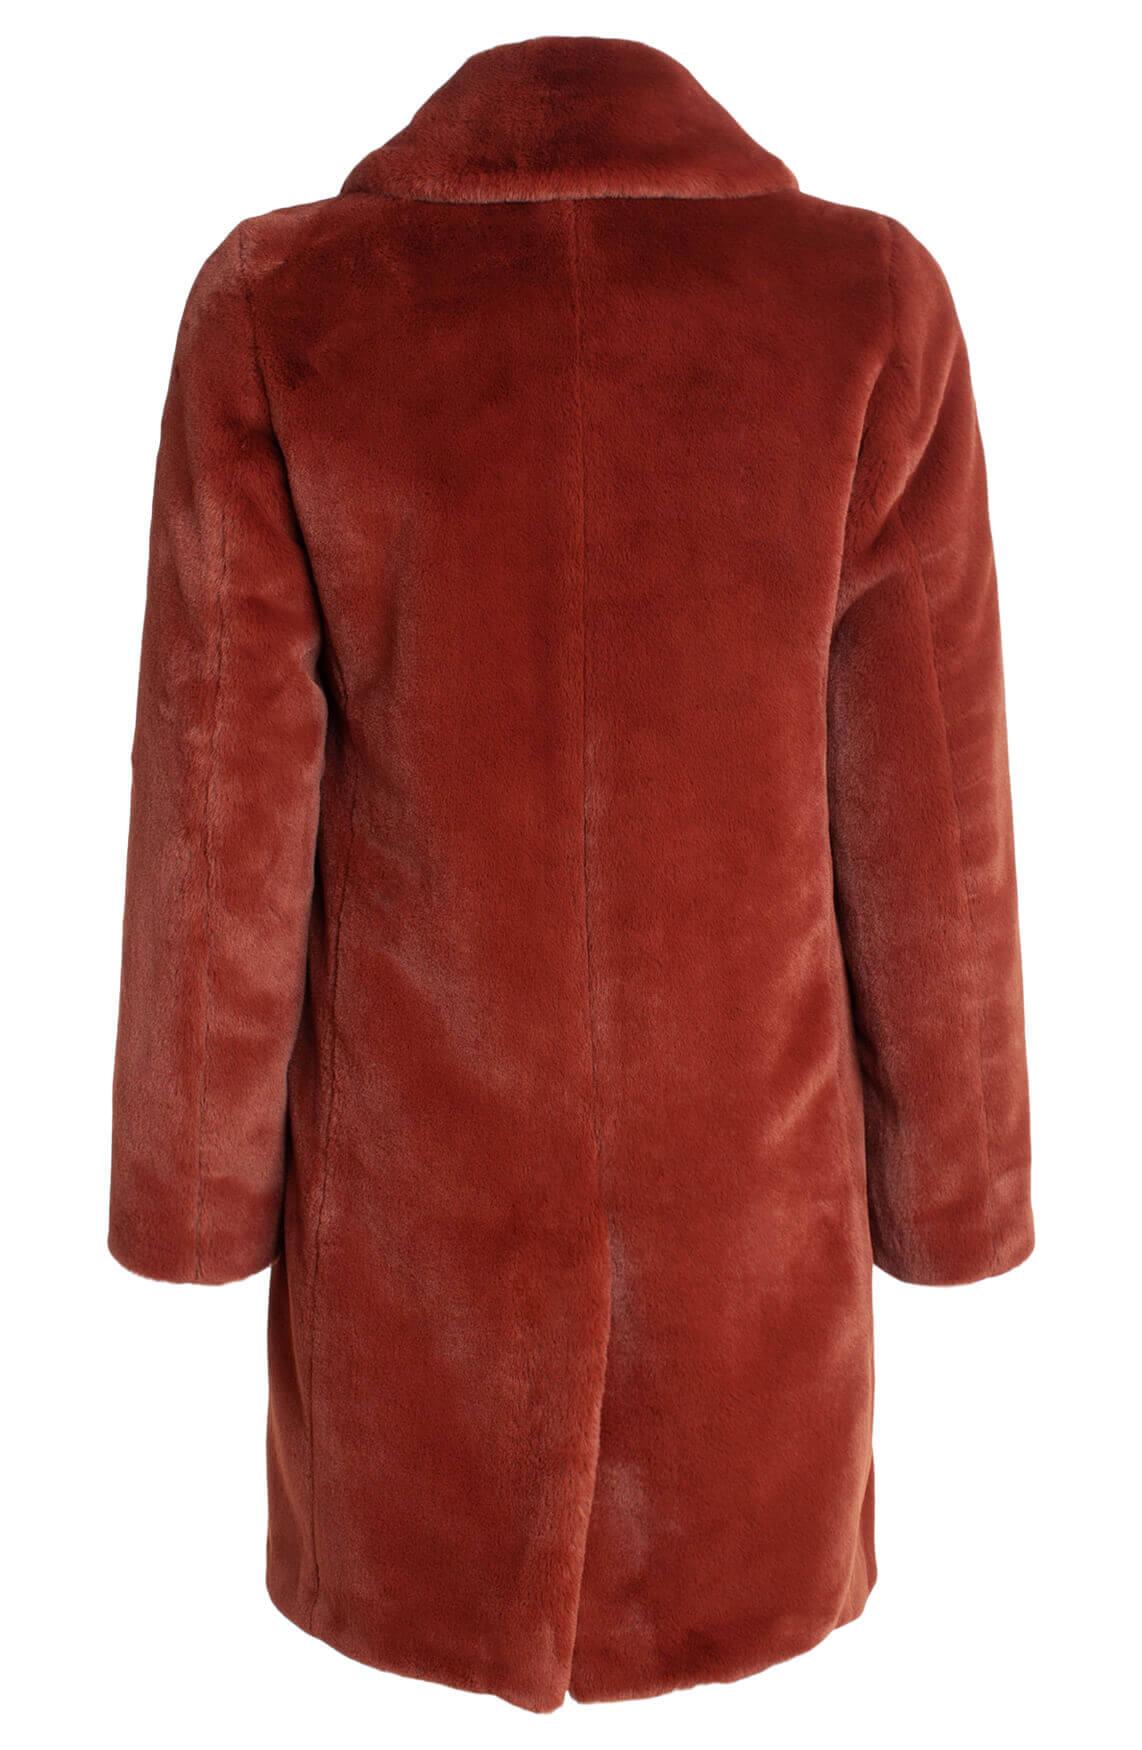 Moscow Dames Fake fur jas Bruin